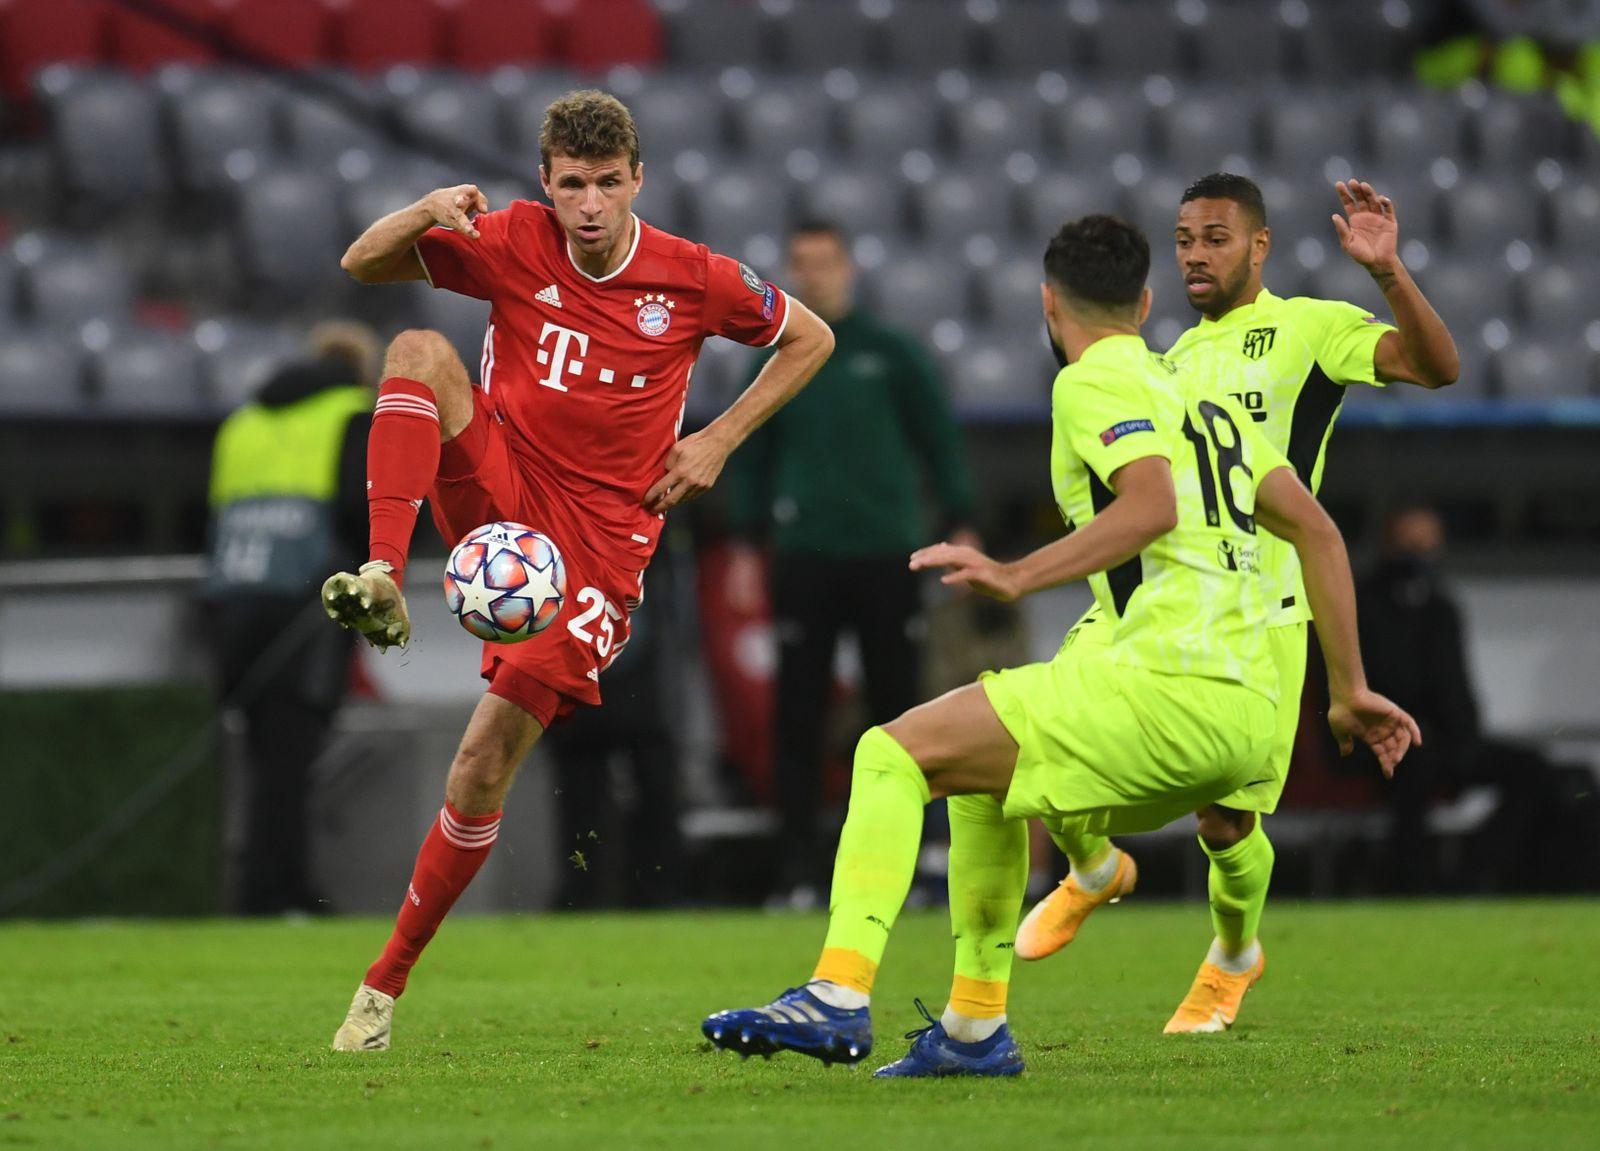 Champions League - Group A - Bayern Munich v Atletico Madrid